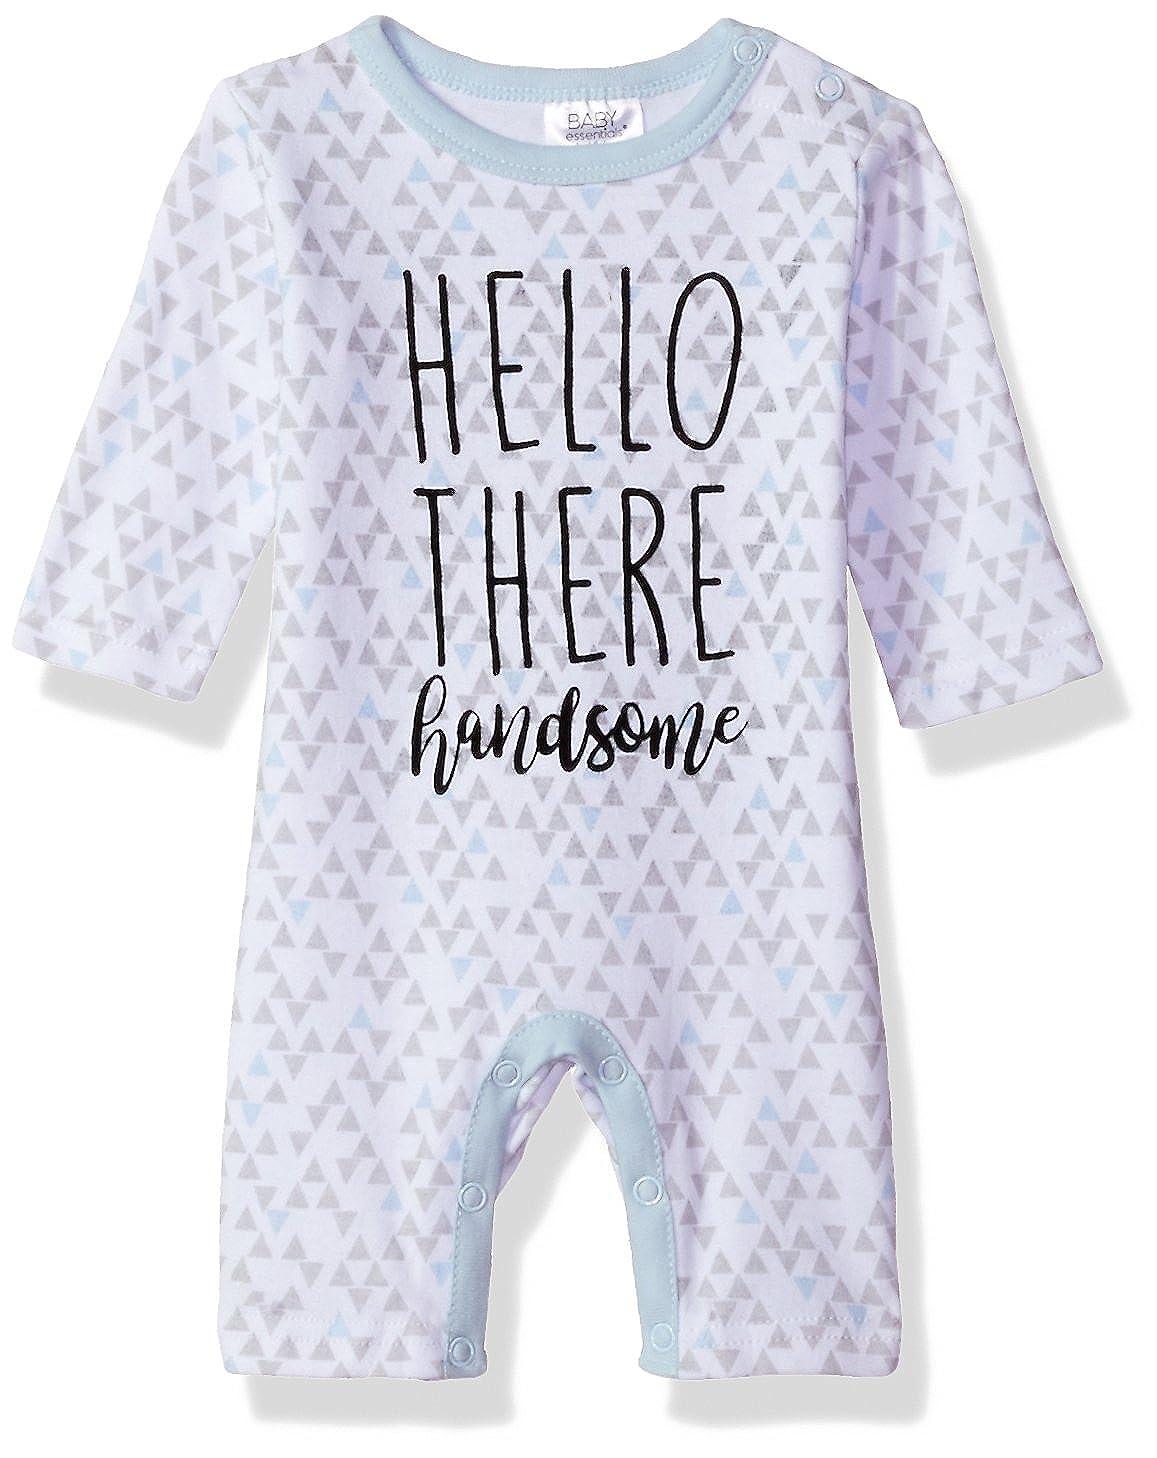 e2337d4d5 Amazon.com  Baby Essentials Baby Boy Coveralls  Clothing